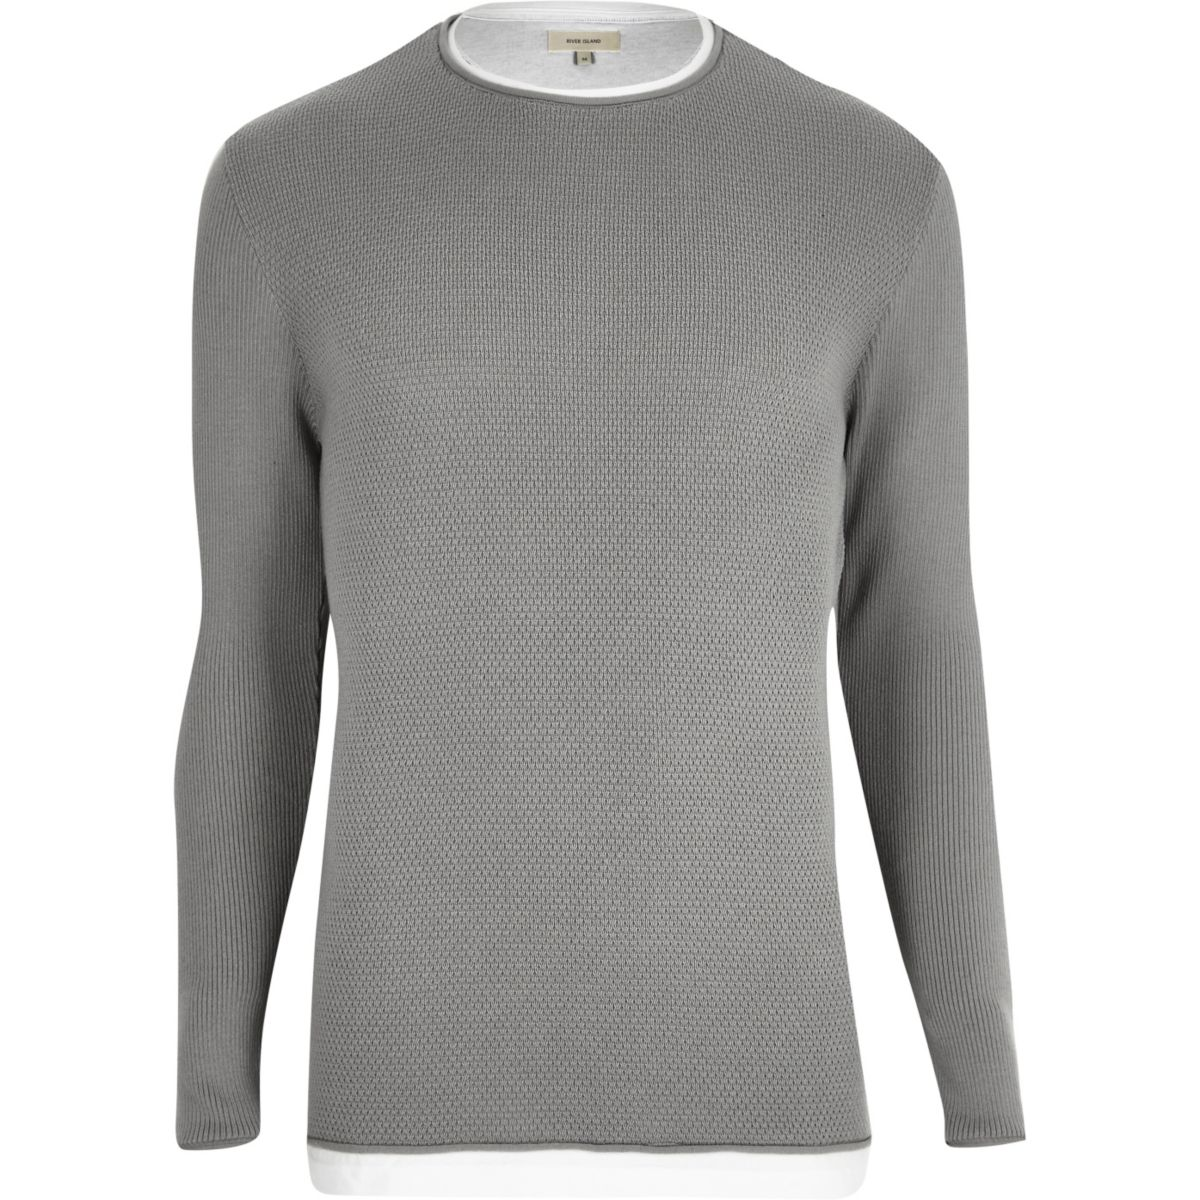 Grey layered longline jumper